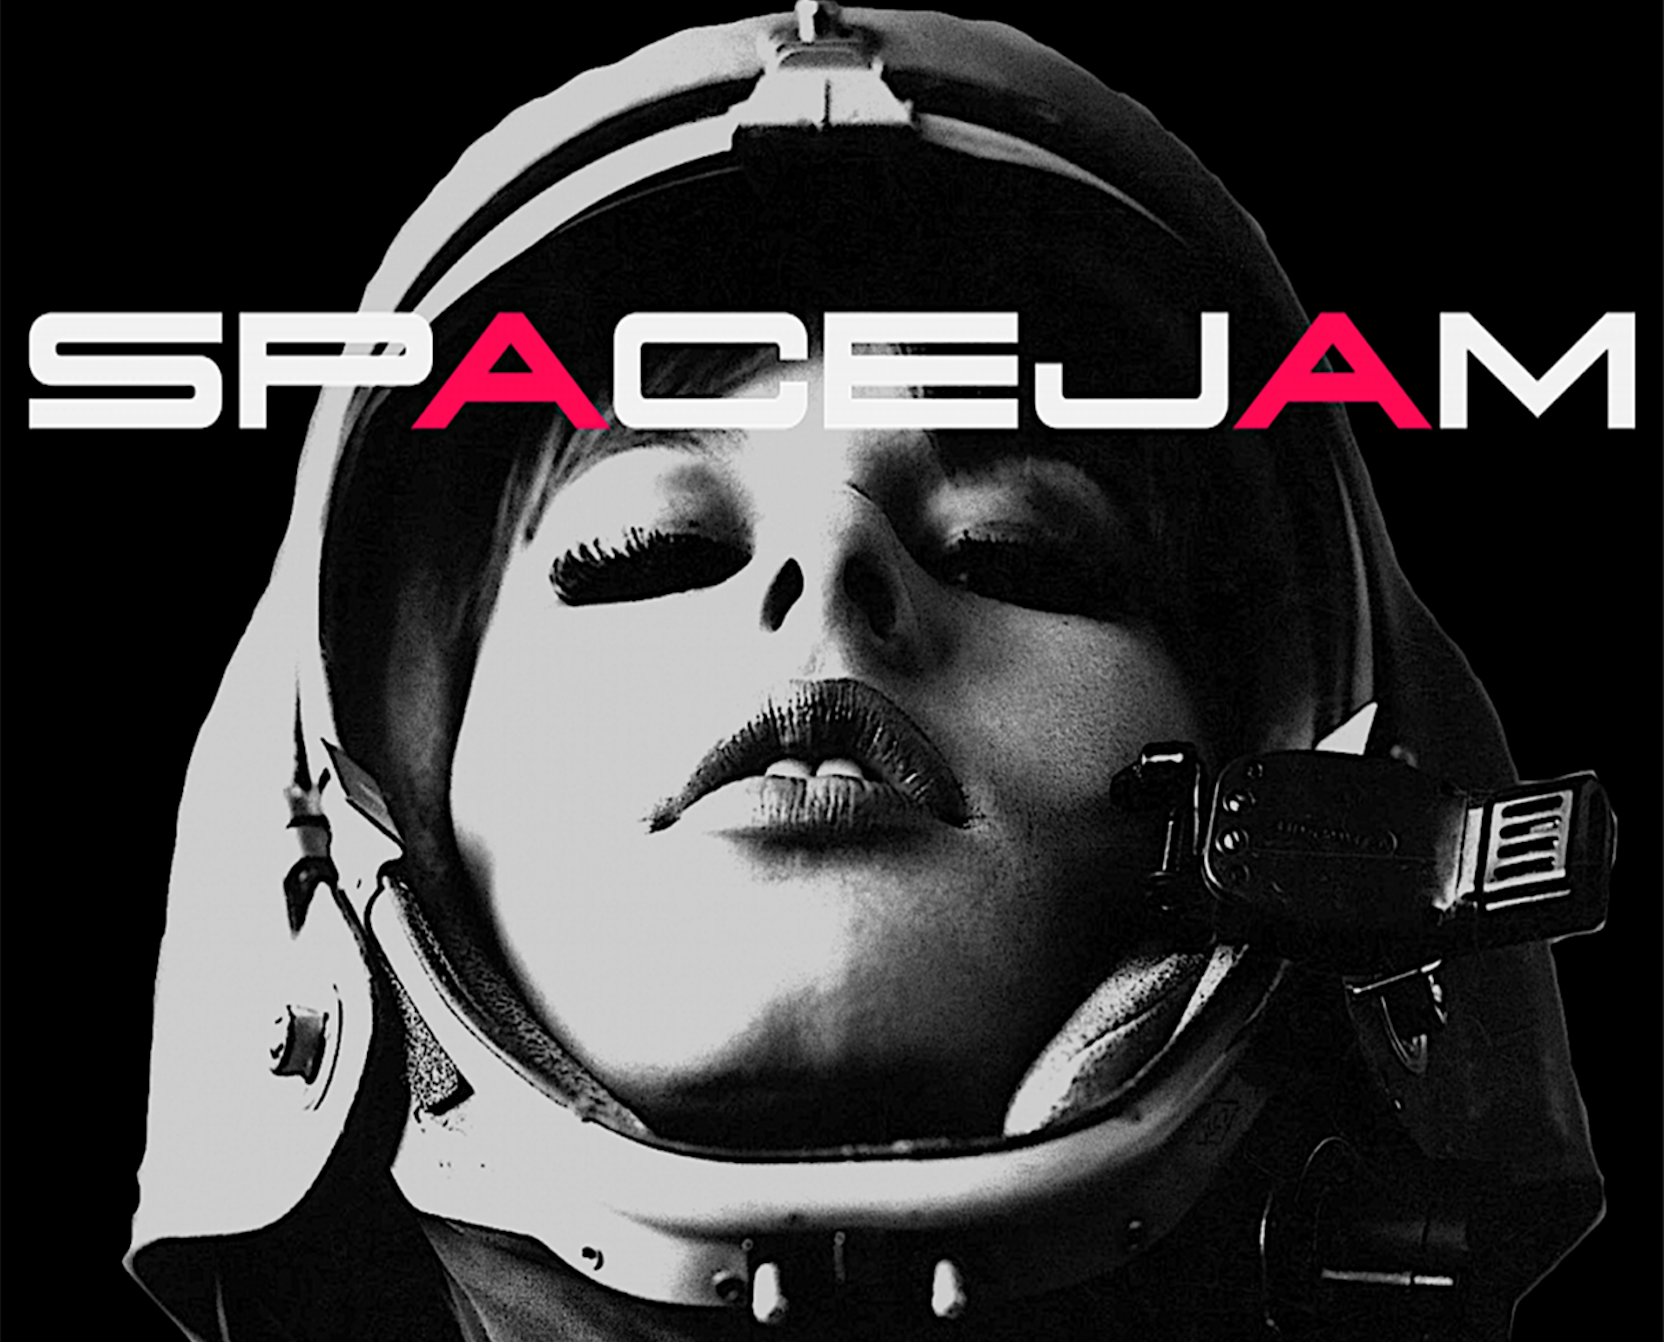 spacejam-lift-off-debut-ep-vorstellung